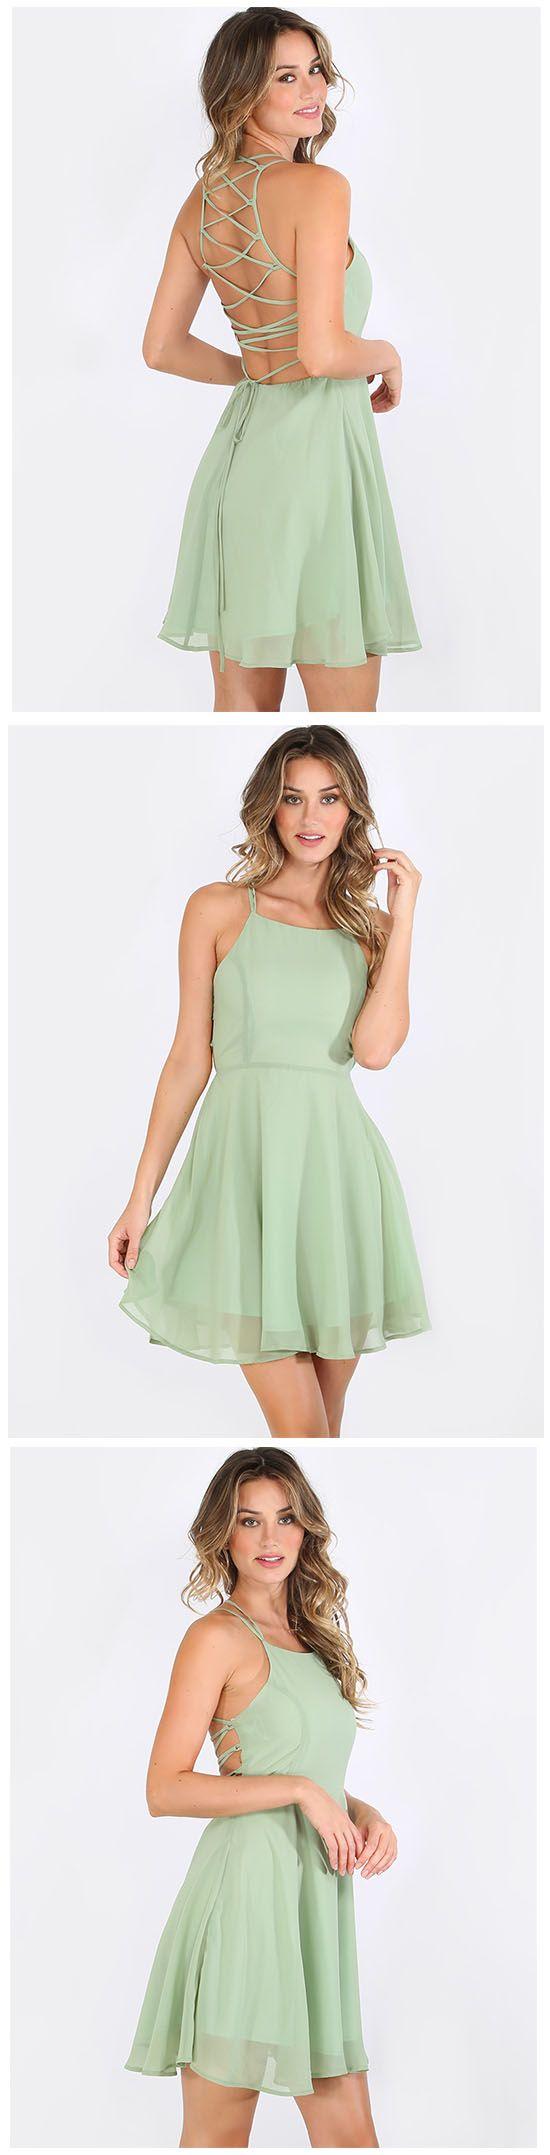 Green Sleeveless Crisscross Lace Up Back Dress